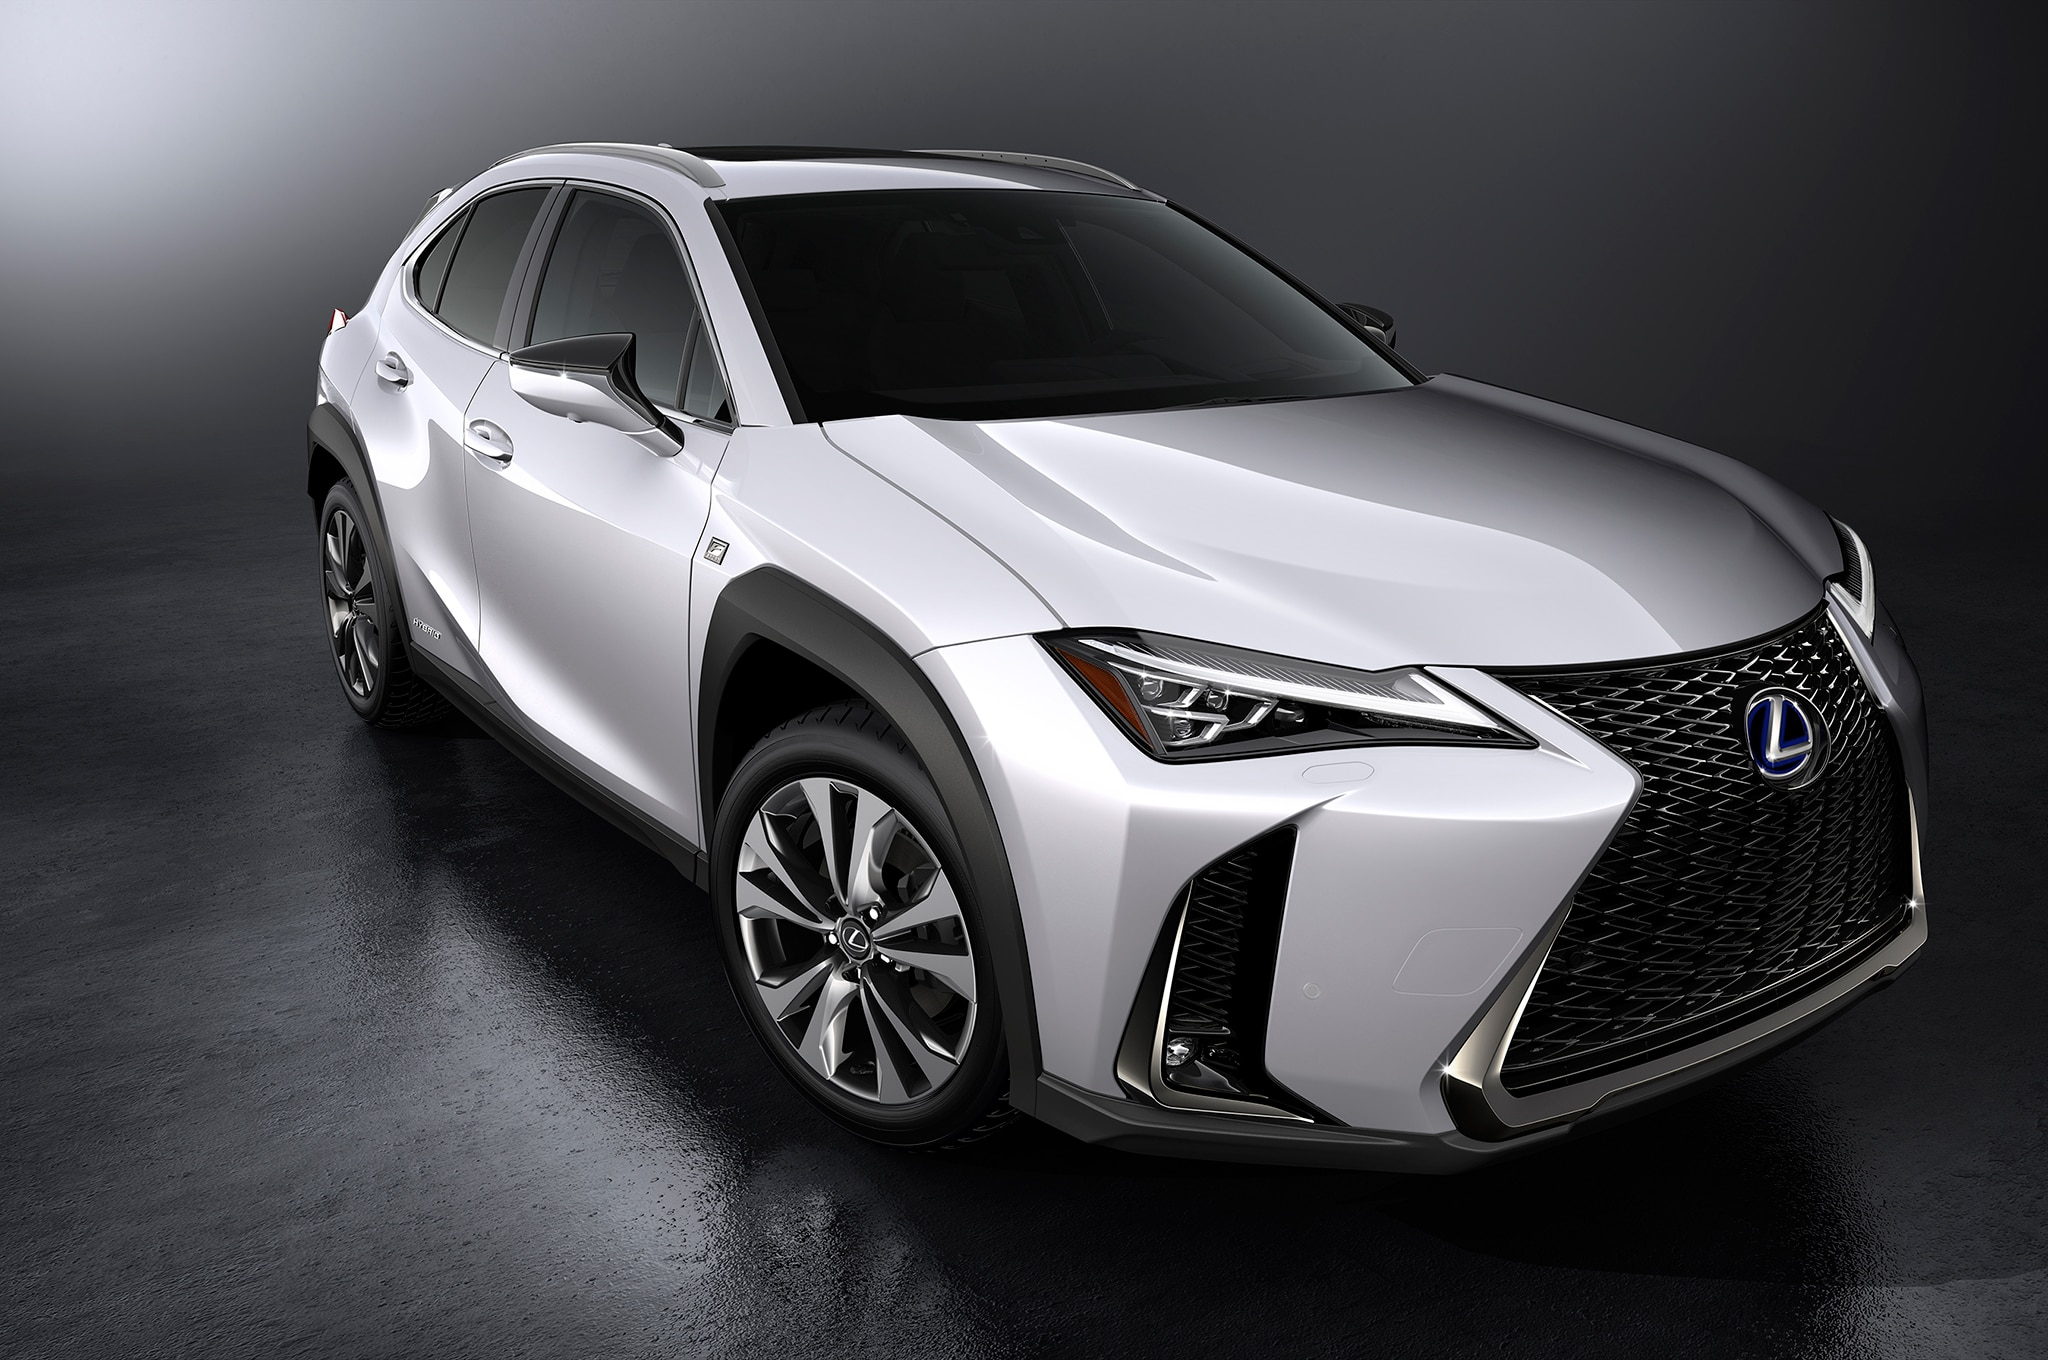 future japanese sports cars nissan gt r lexus sc and toyota supra. Black Bedroom Furniture Sets. Home Design Ideas